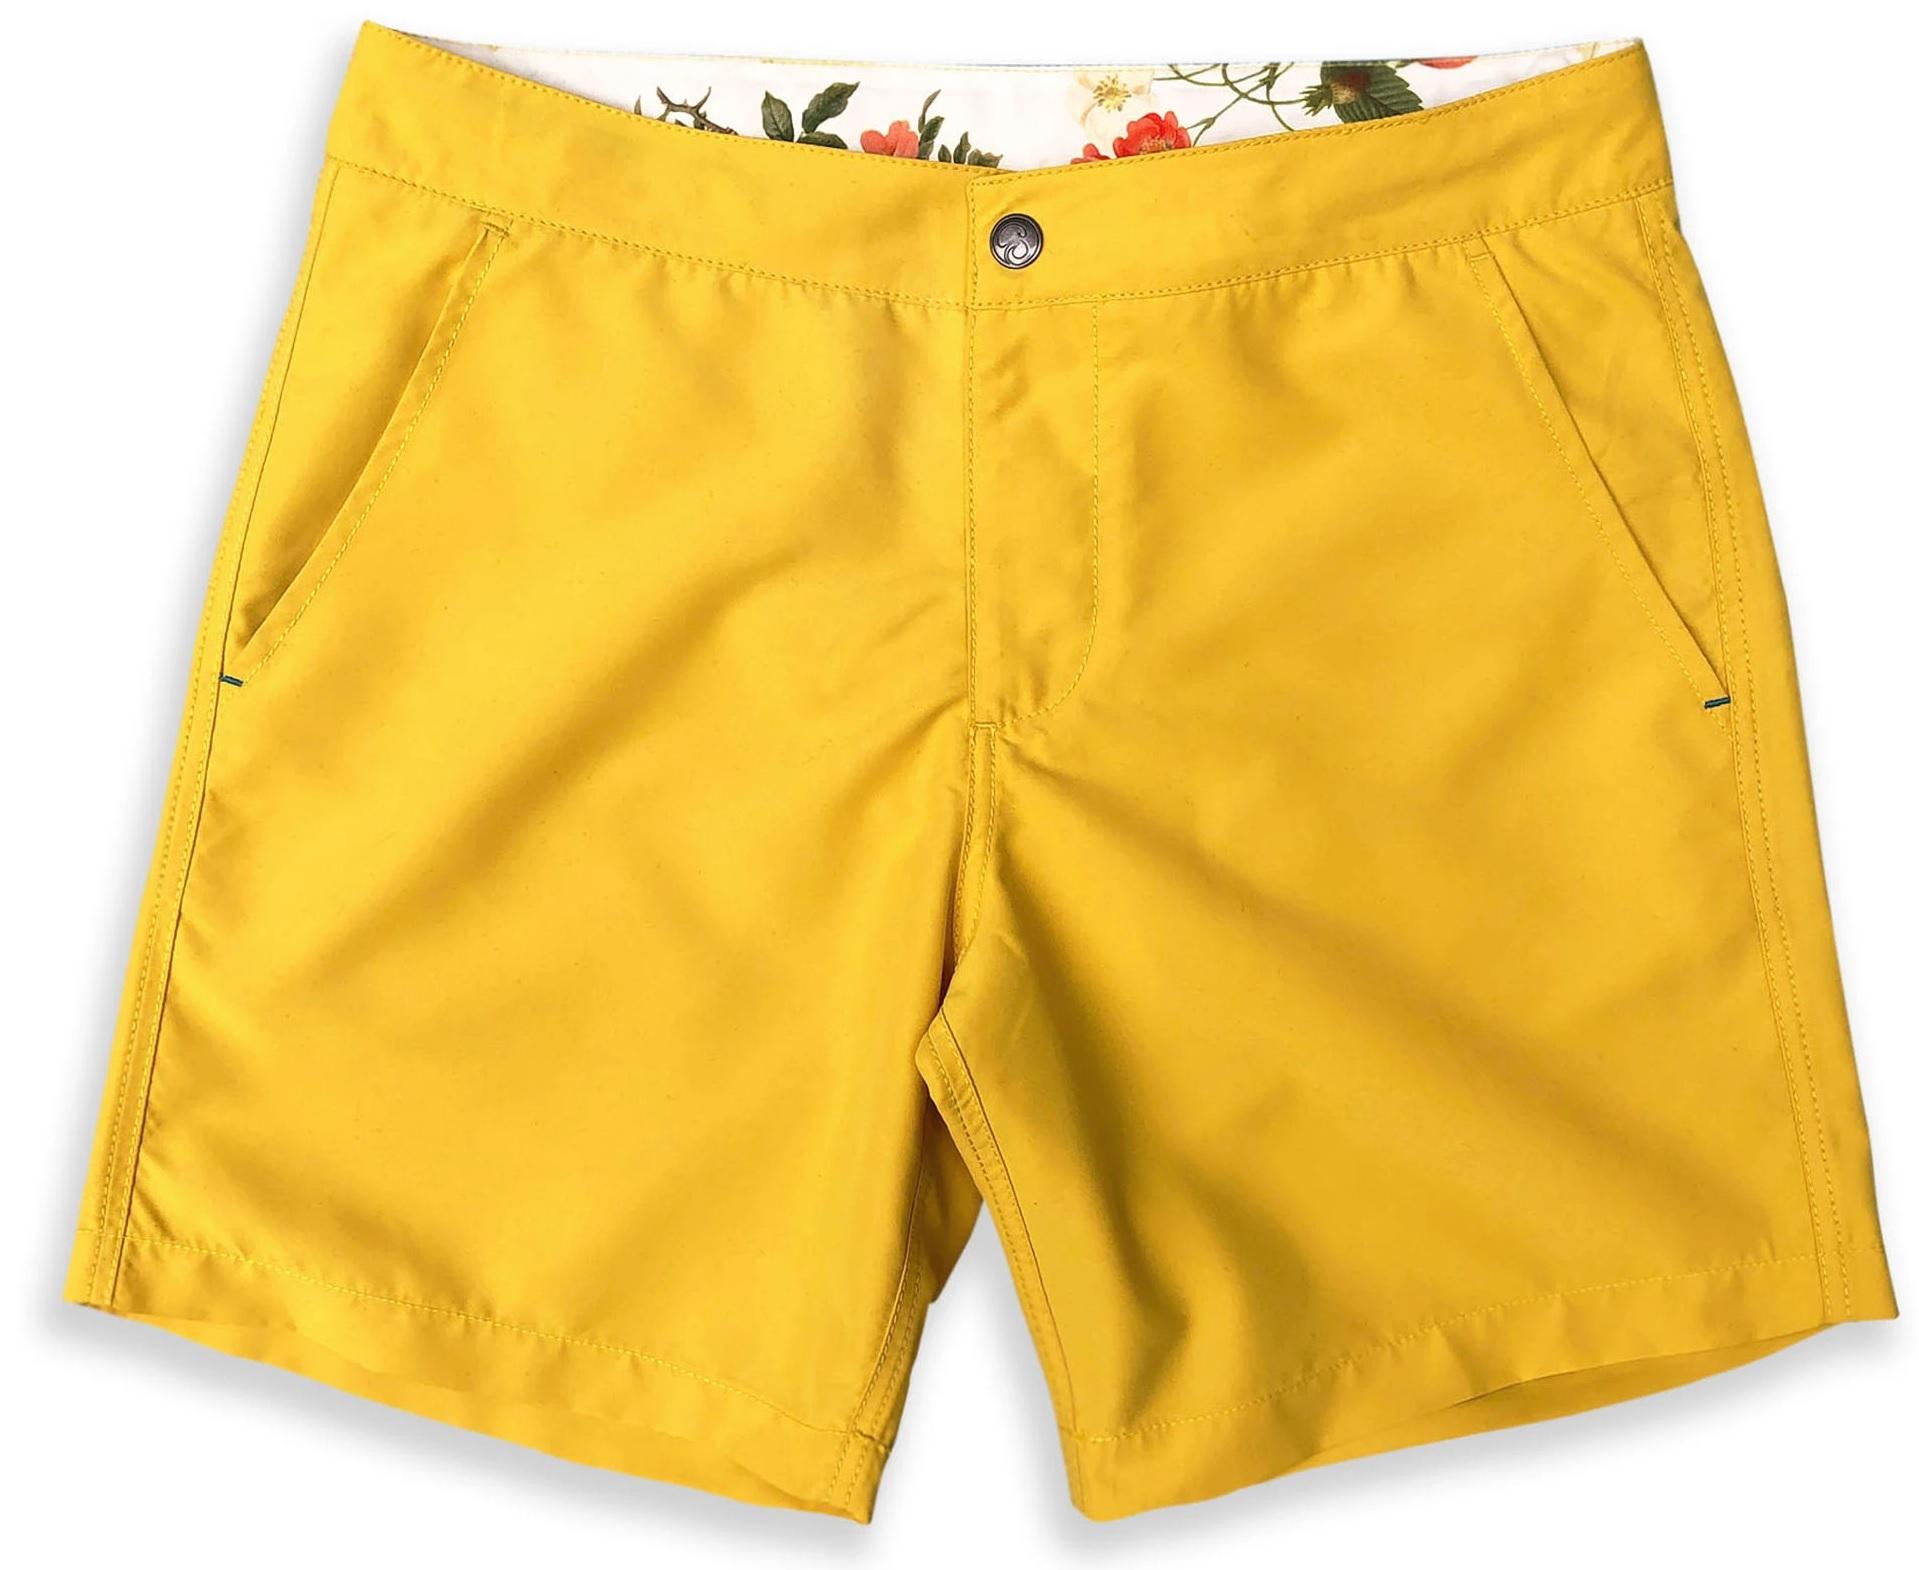 badeshorts gule mænd